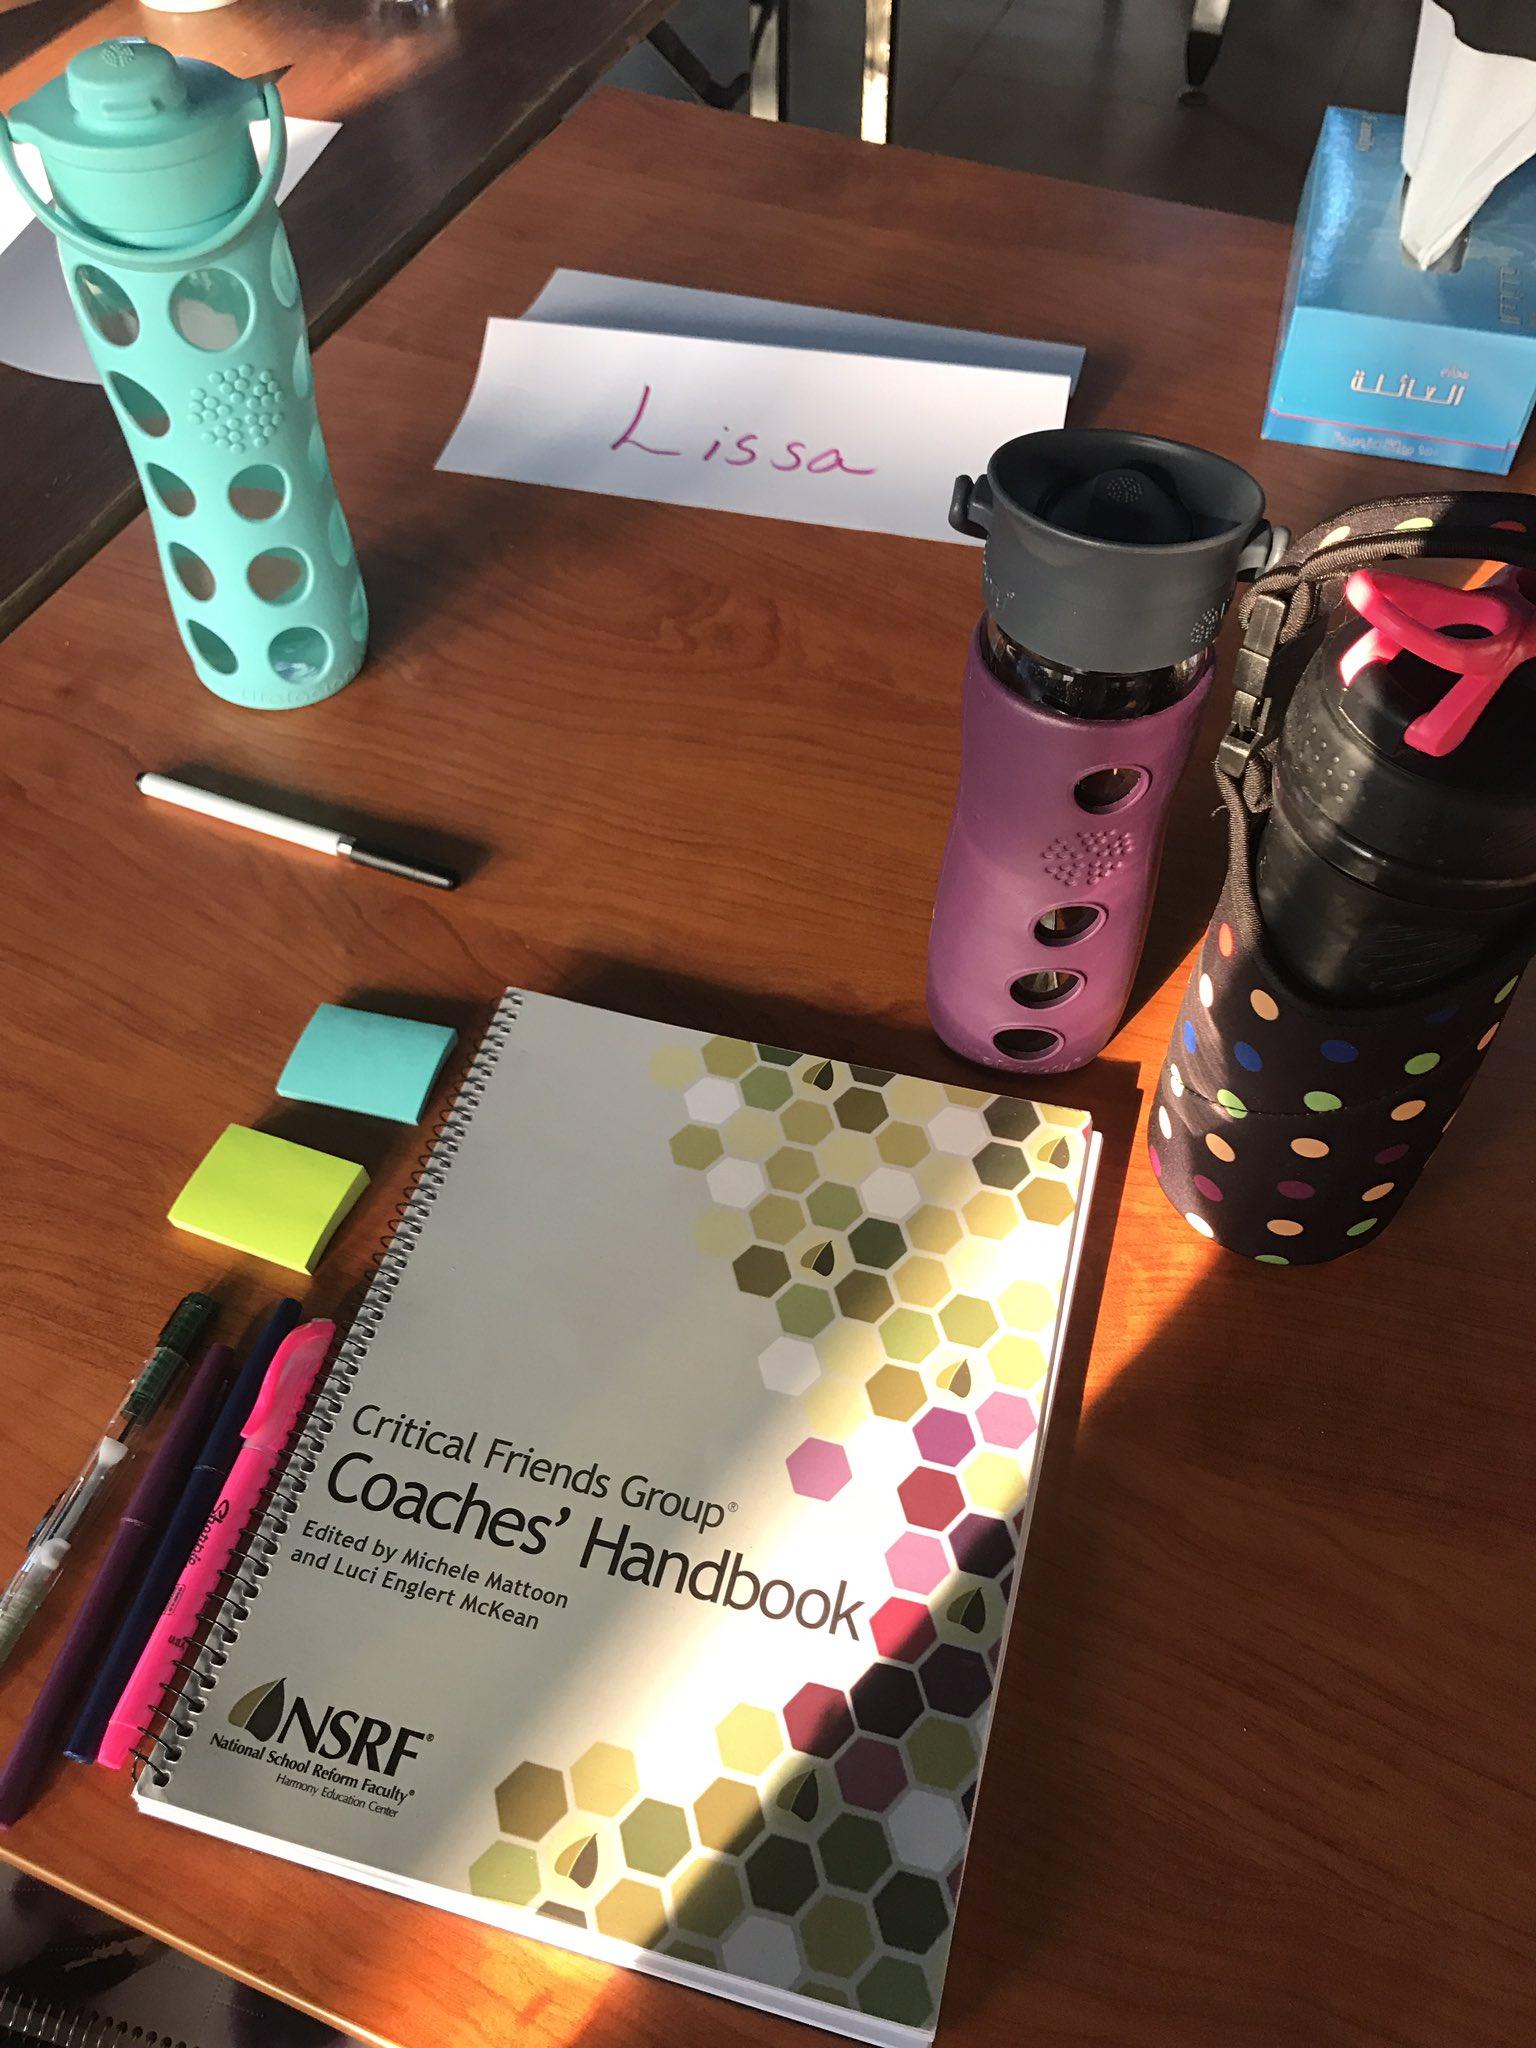 Day 2 of #CriticalFriends Coach training! #CFGwork #AISQ8 https://t.co/vQhVpGwuoQ